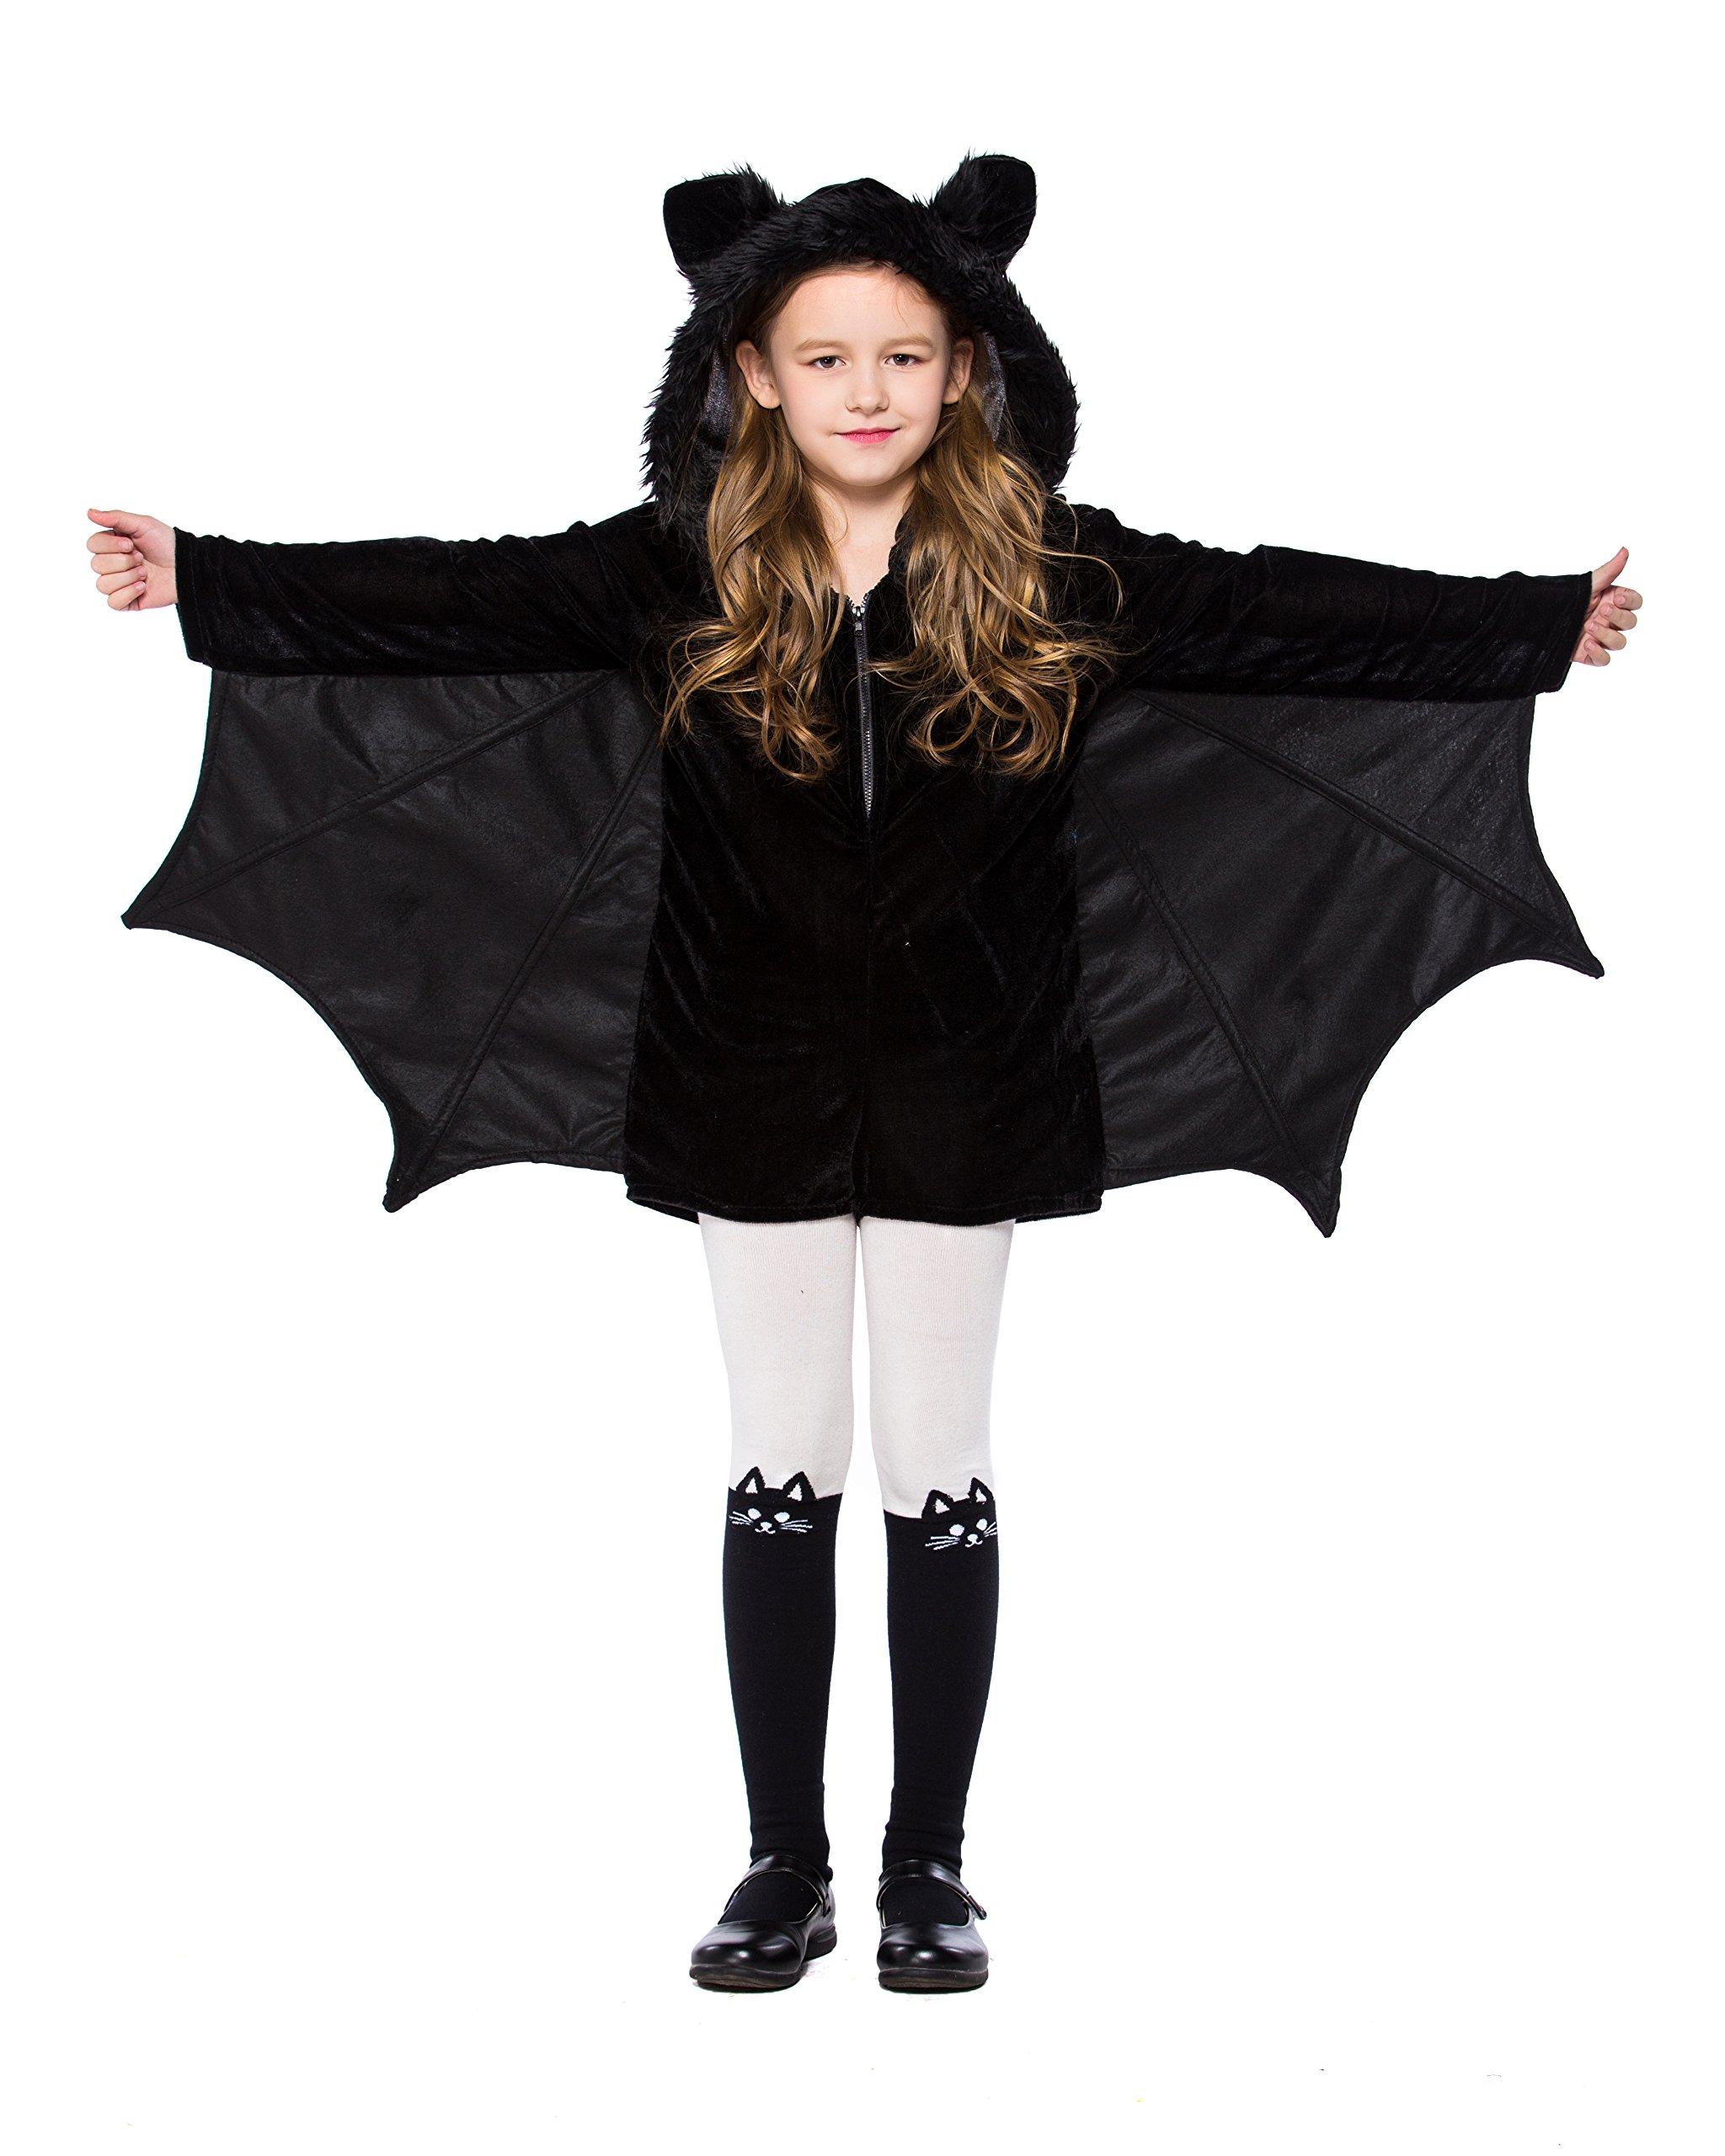 yolsun Girls' Vampire bat Costume, Halloween Animal Cute Dress up (4-6y(Suggested Height:38''-47''), Black-1) by yolsun